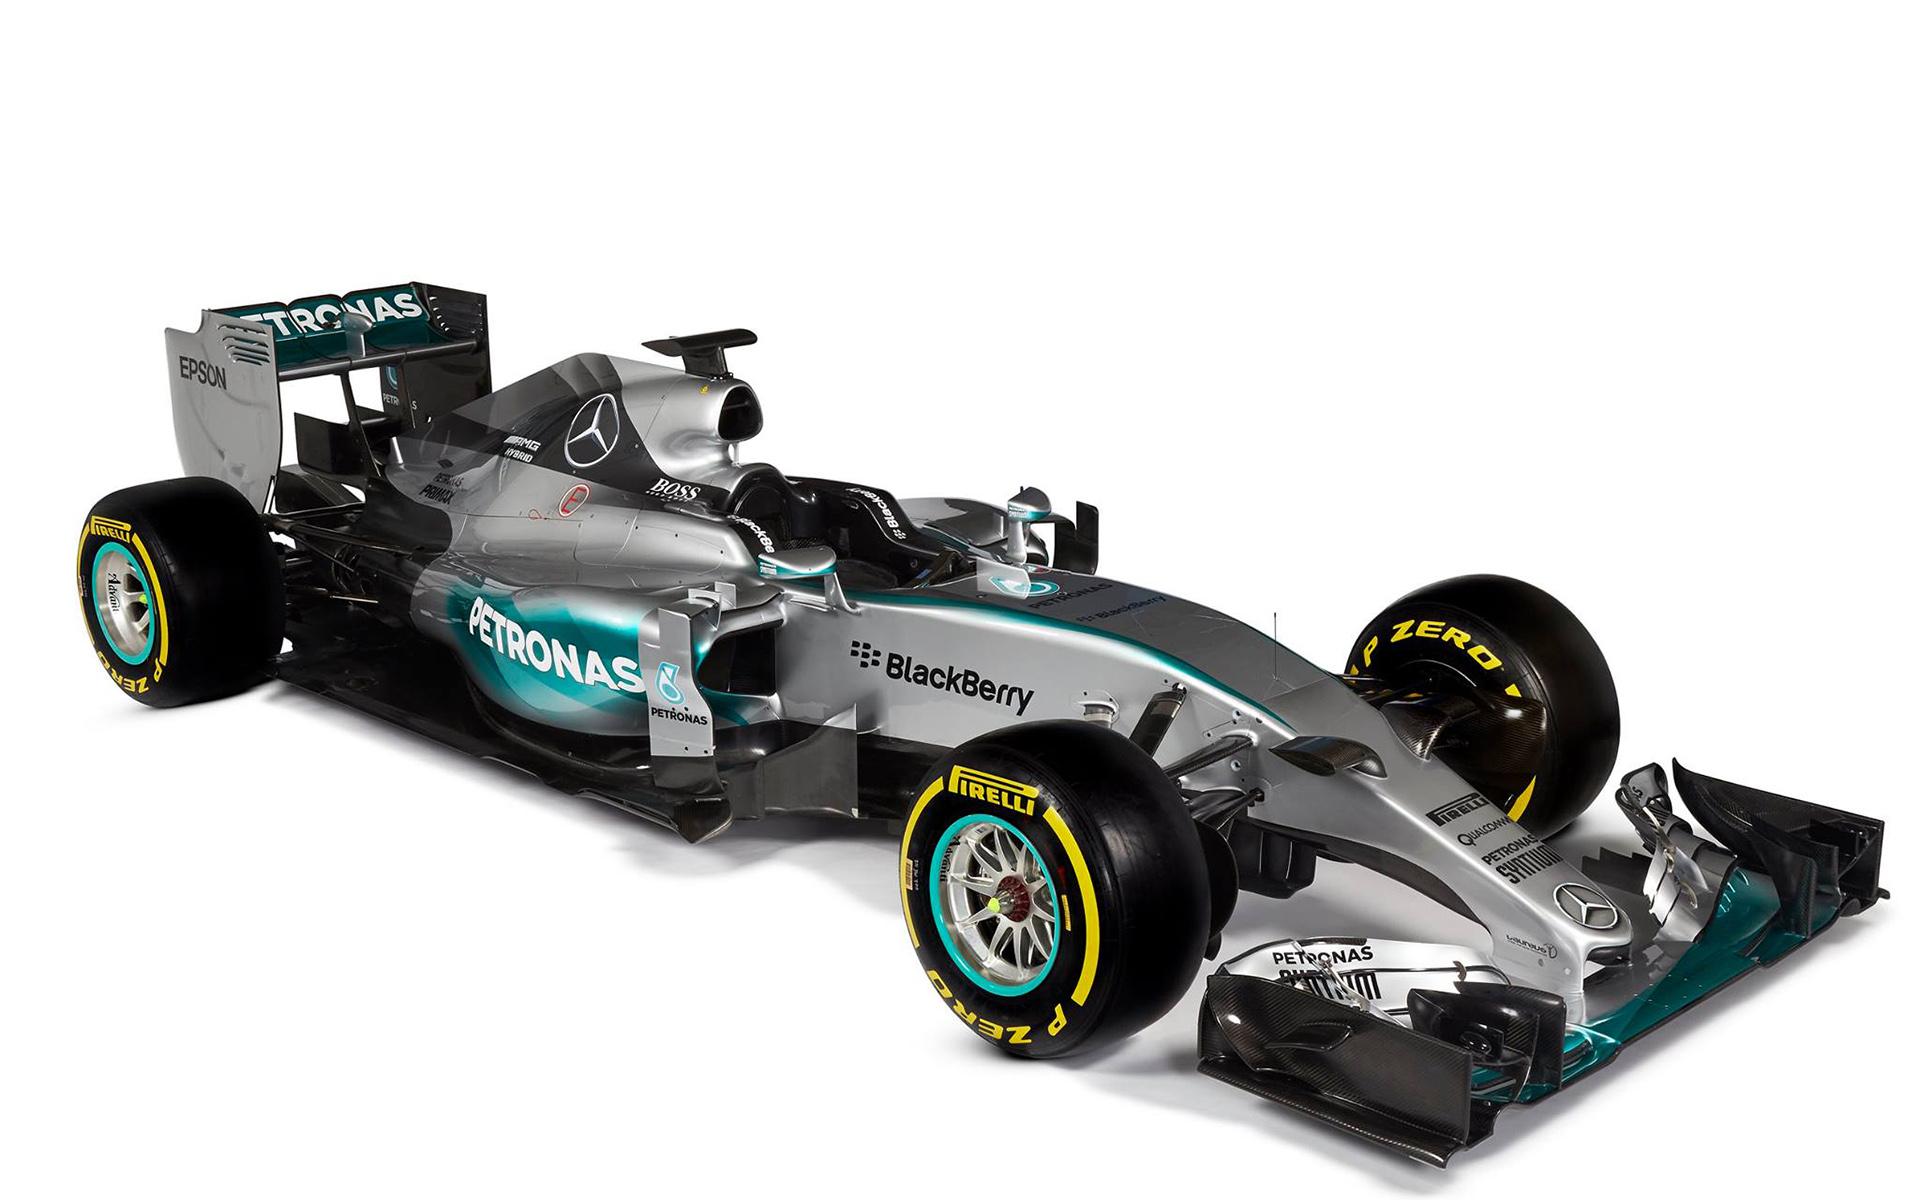 Mclaren Formula 1: [48+] McLaren Formula 1 Wallpaper On WallpaperSafari